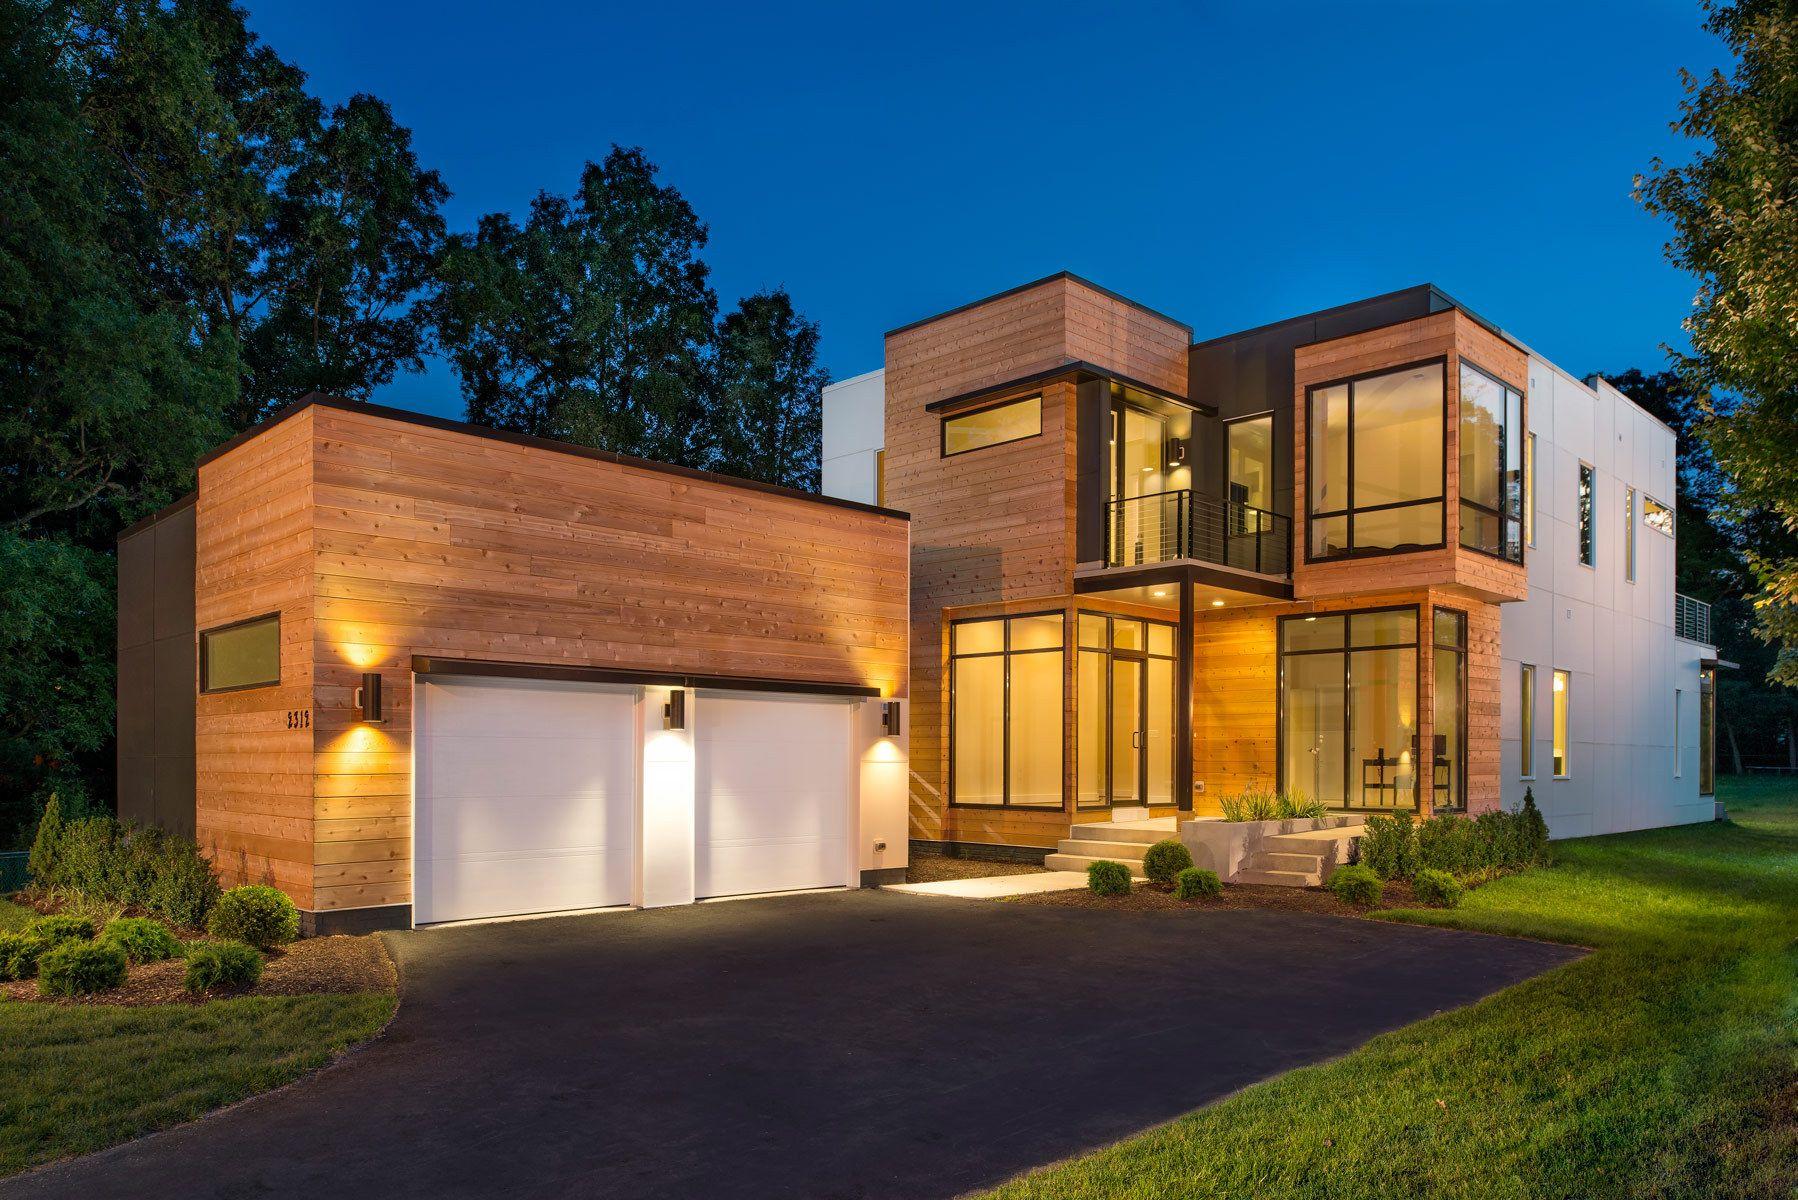 Architect: W.C. Ralston Architects